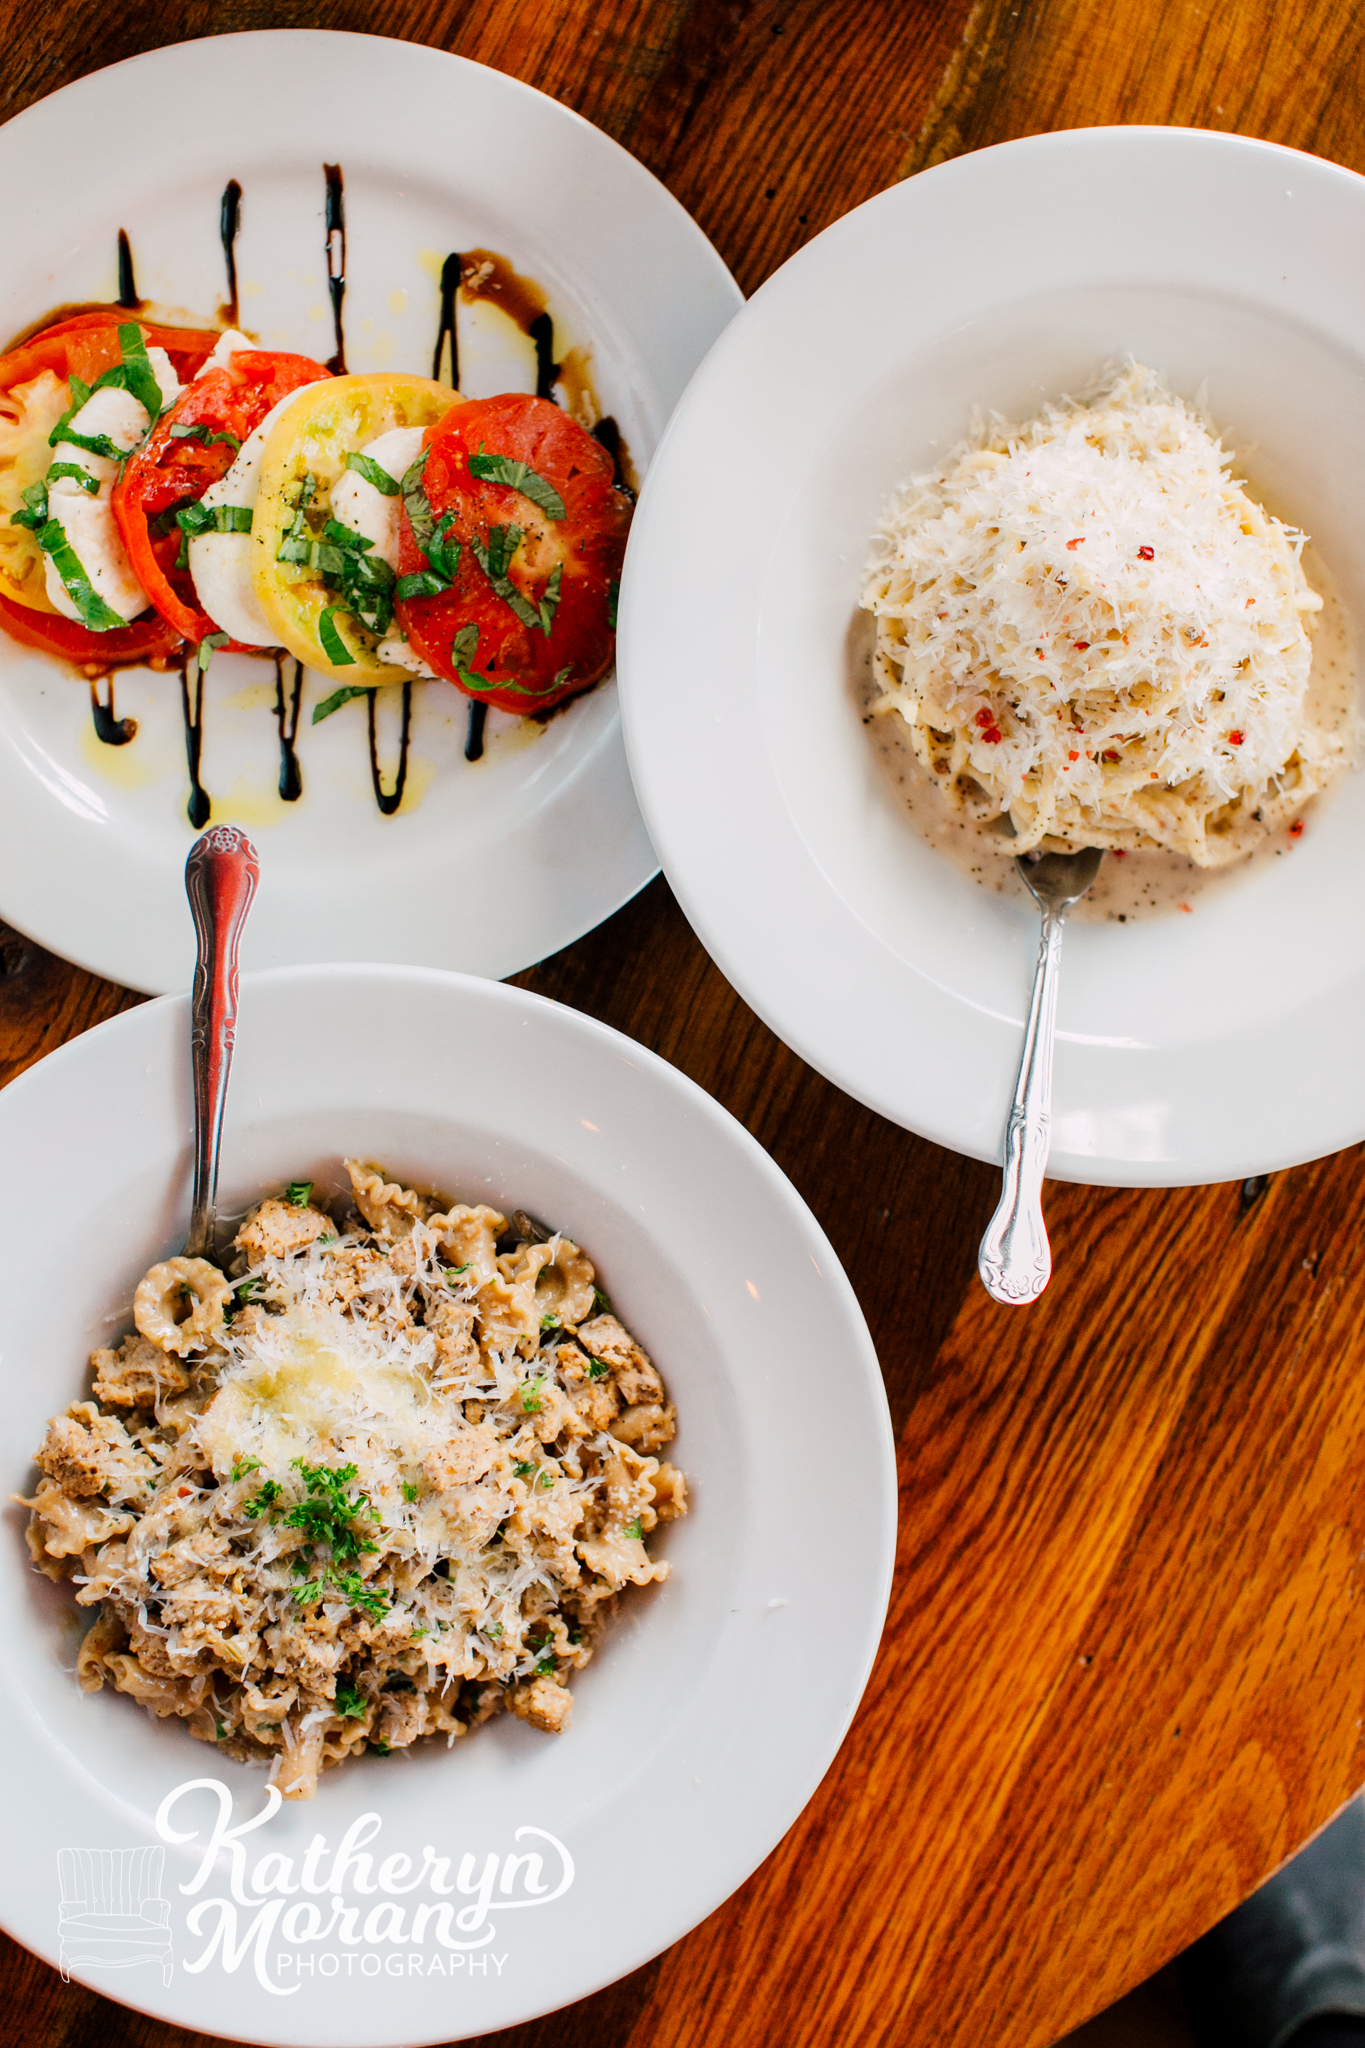 seattle-food-photographer-katheryn-moran-due-cucuina-italiana-2018-17.jpg